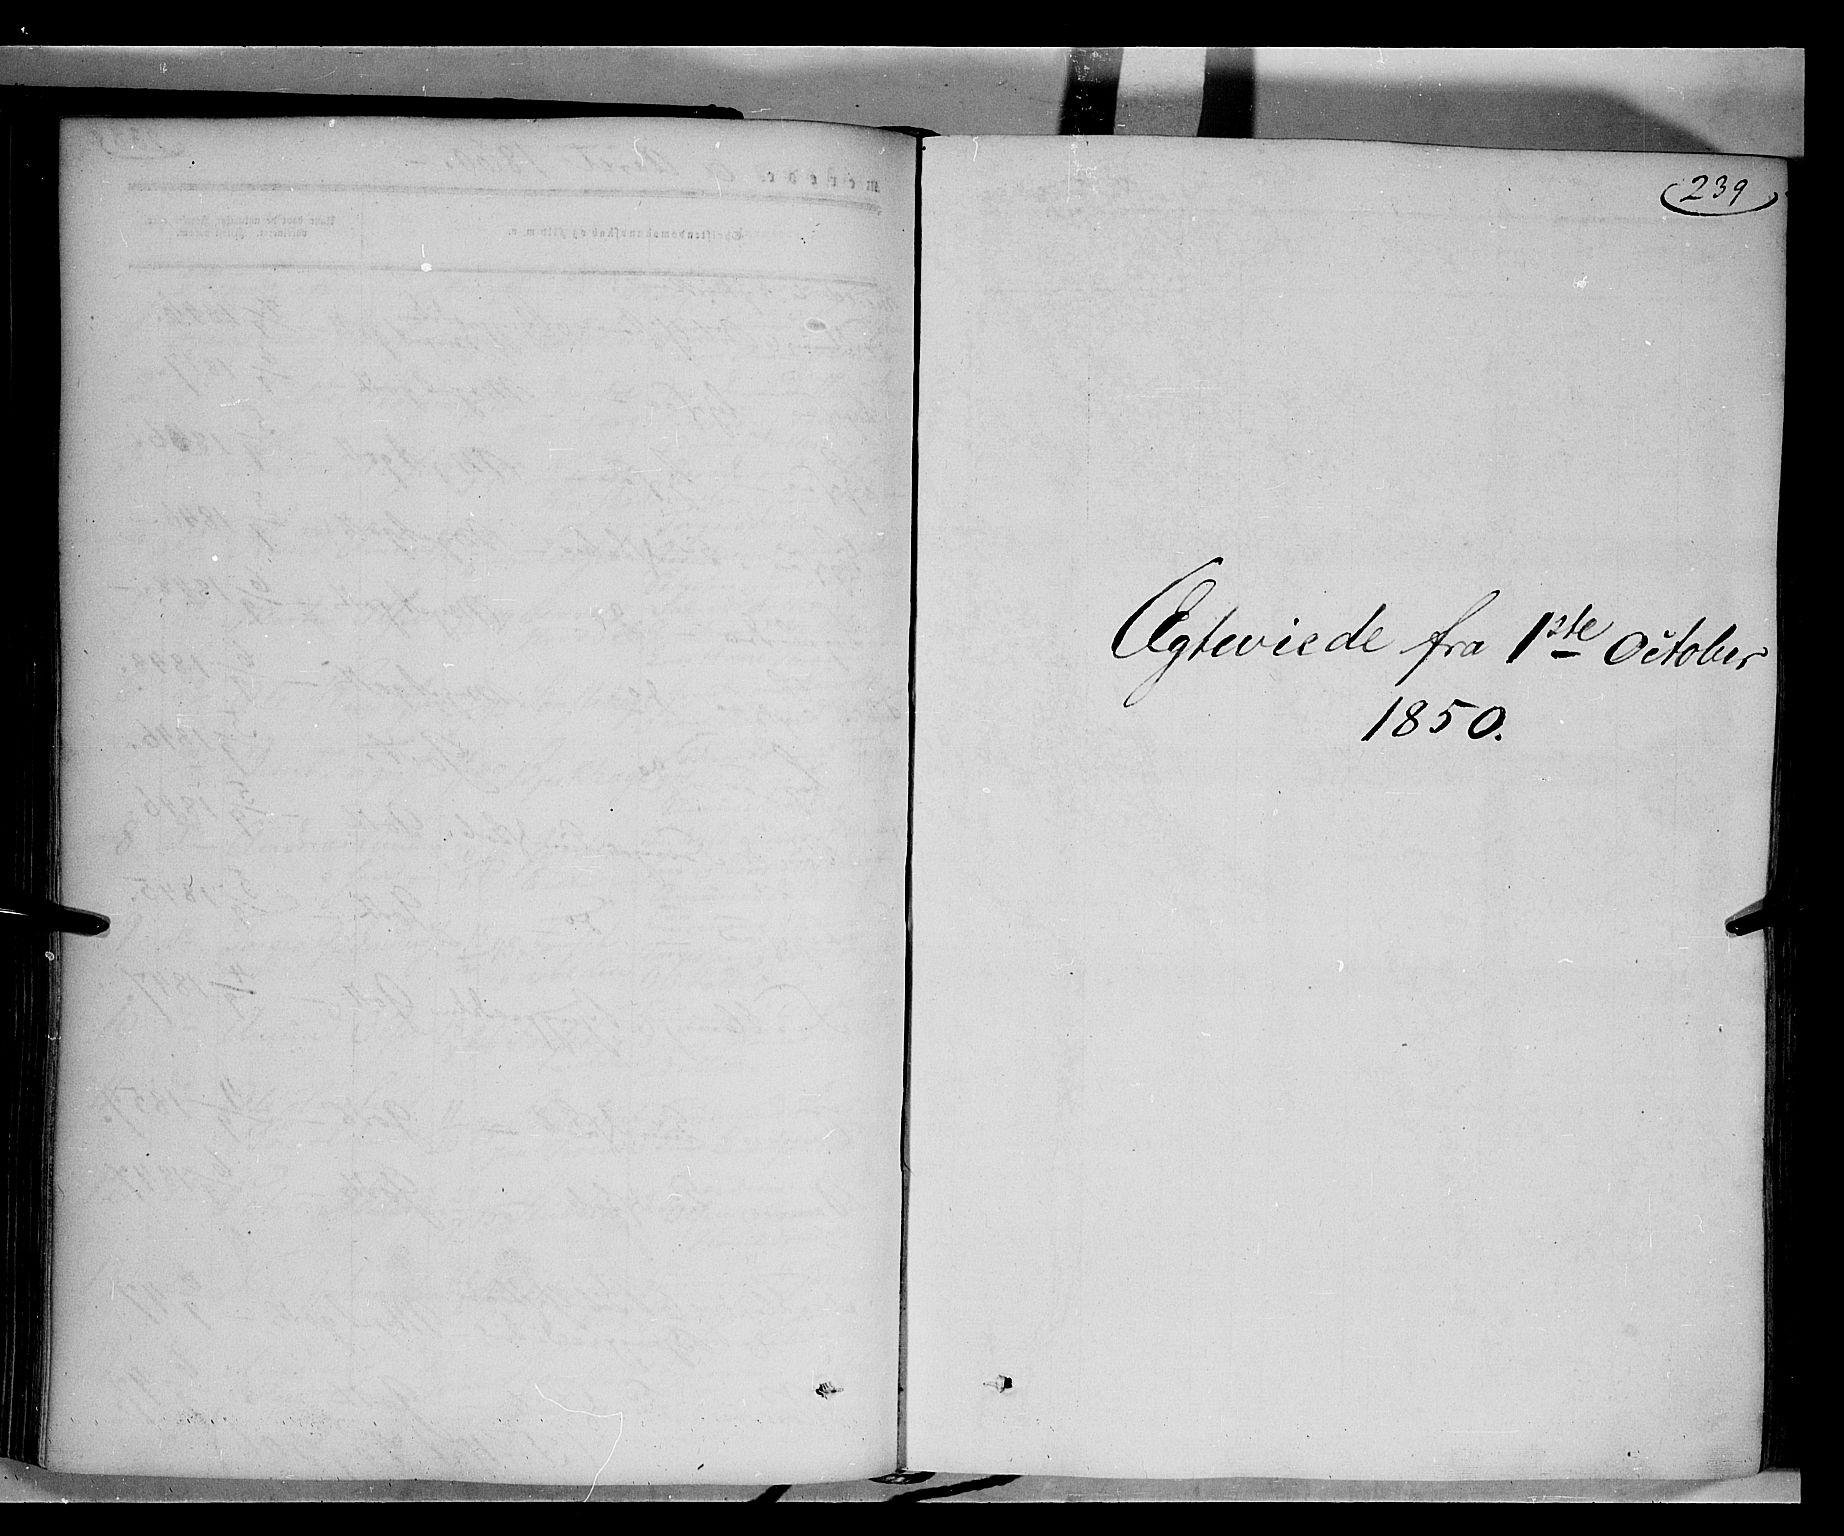 SAH, Gausdal prestekontor, Ministerialbok nr. 8, 1850-1861, s. 239